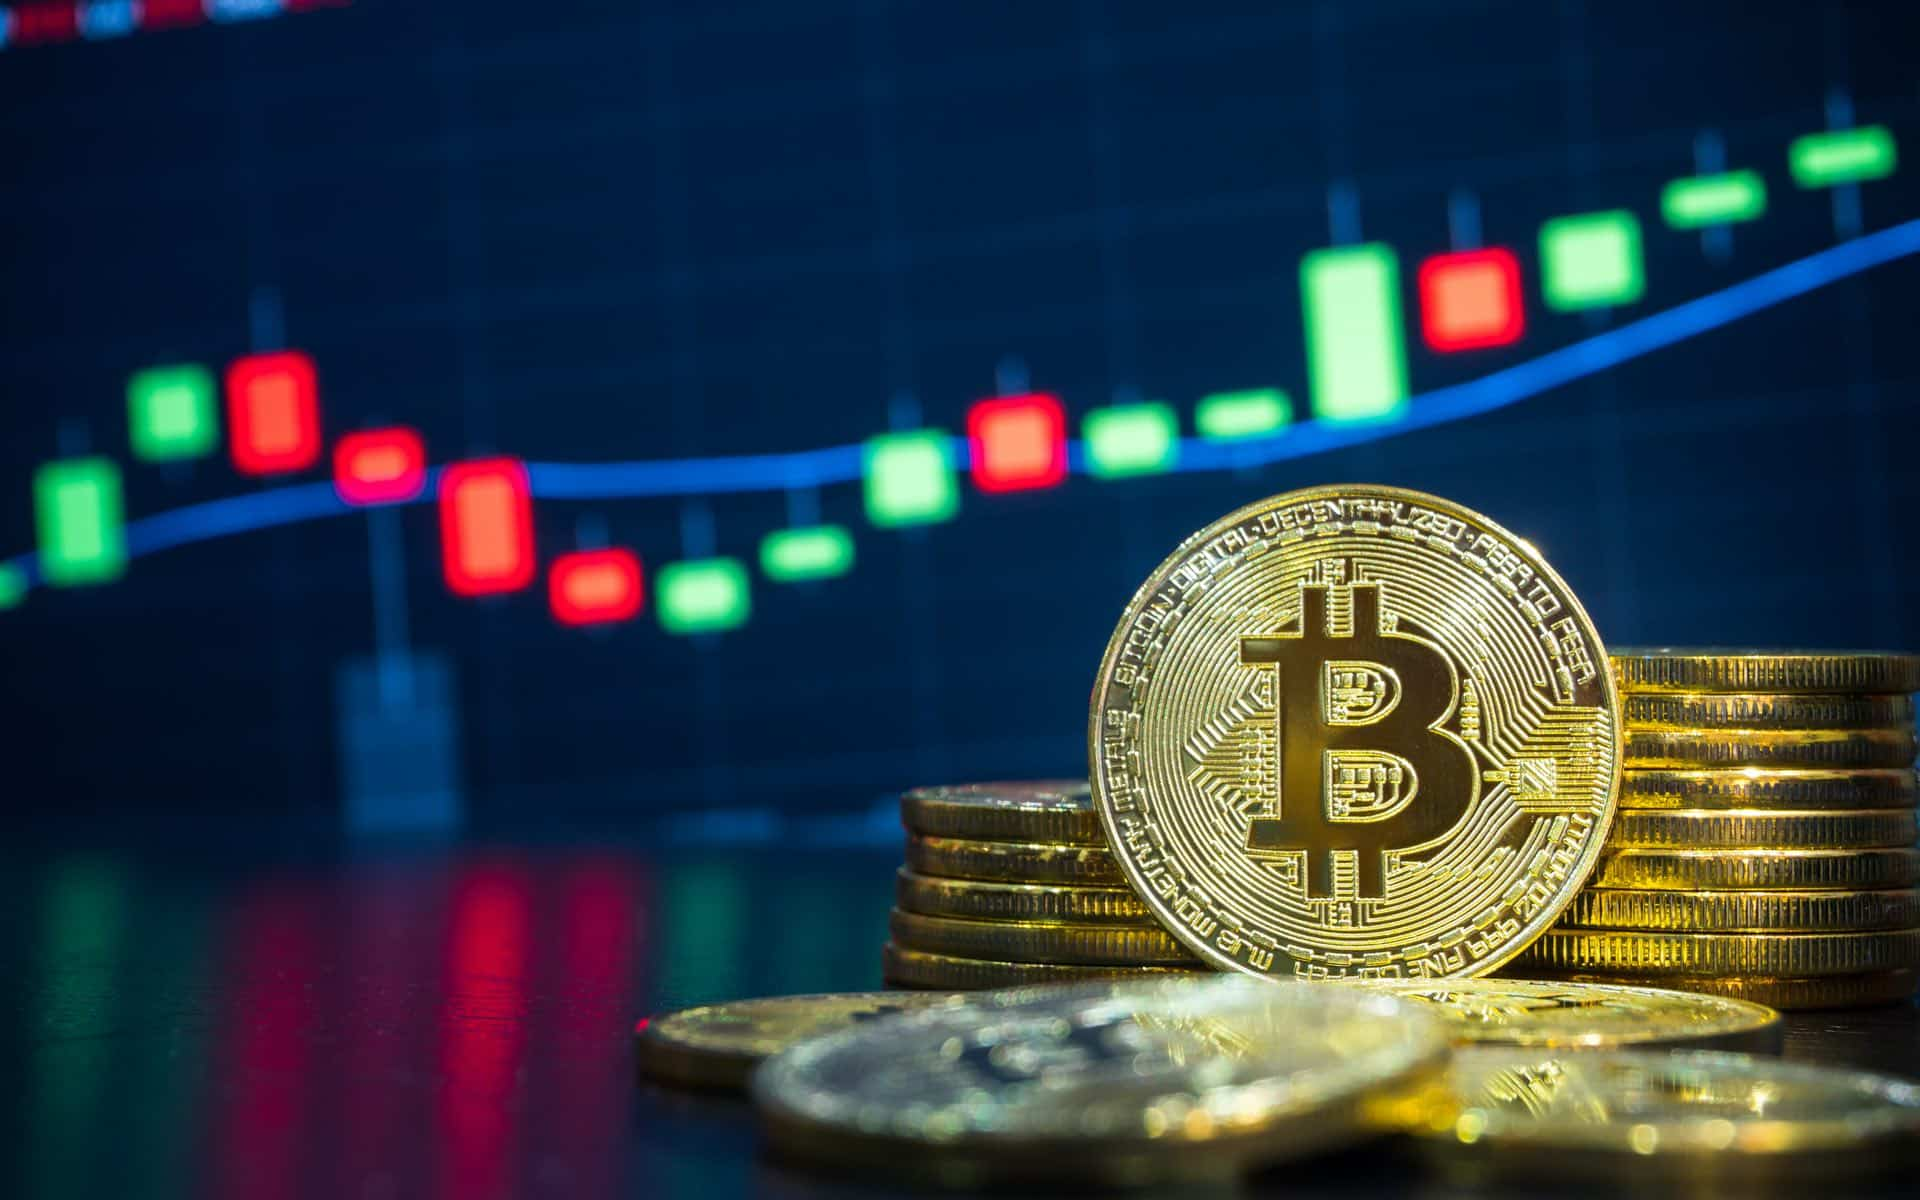 Bitcoin Transfer Volume Hits Over $15 Trillion in 2021